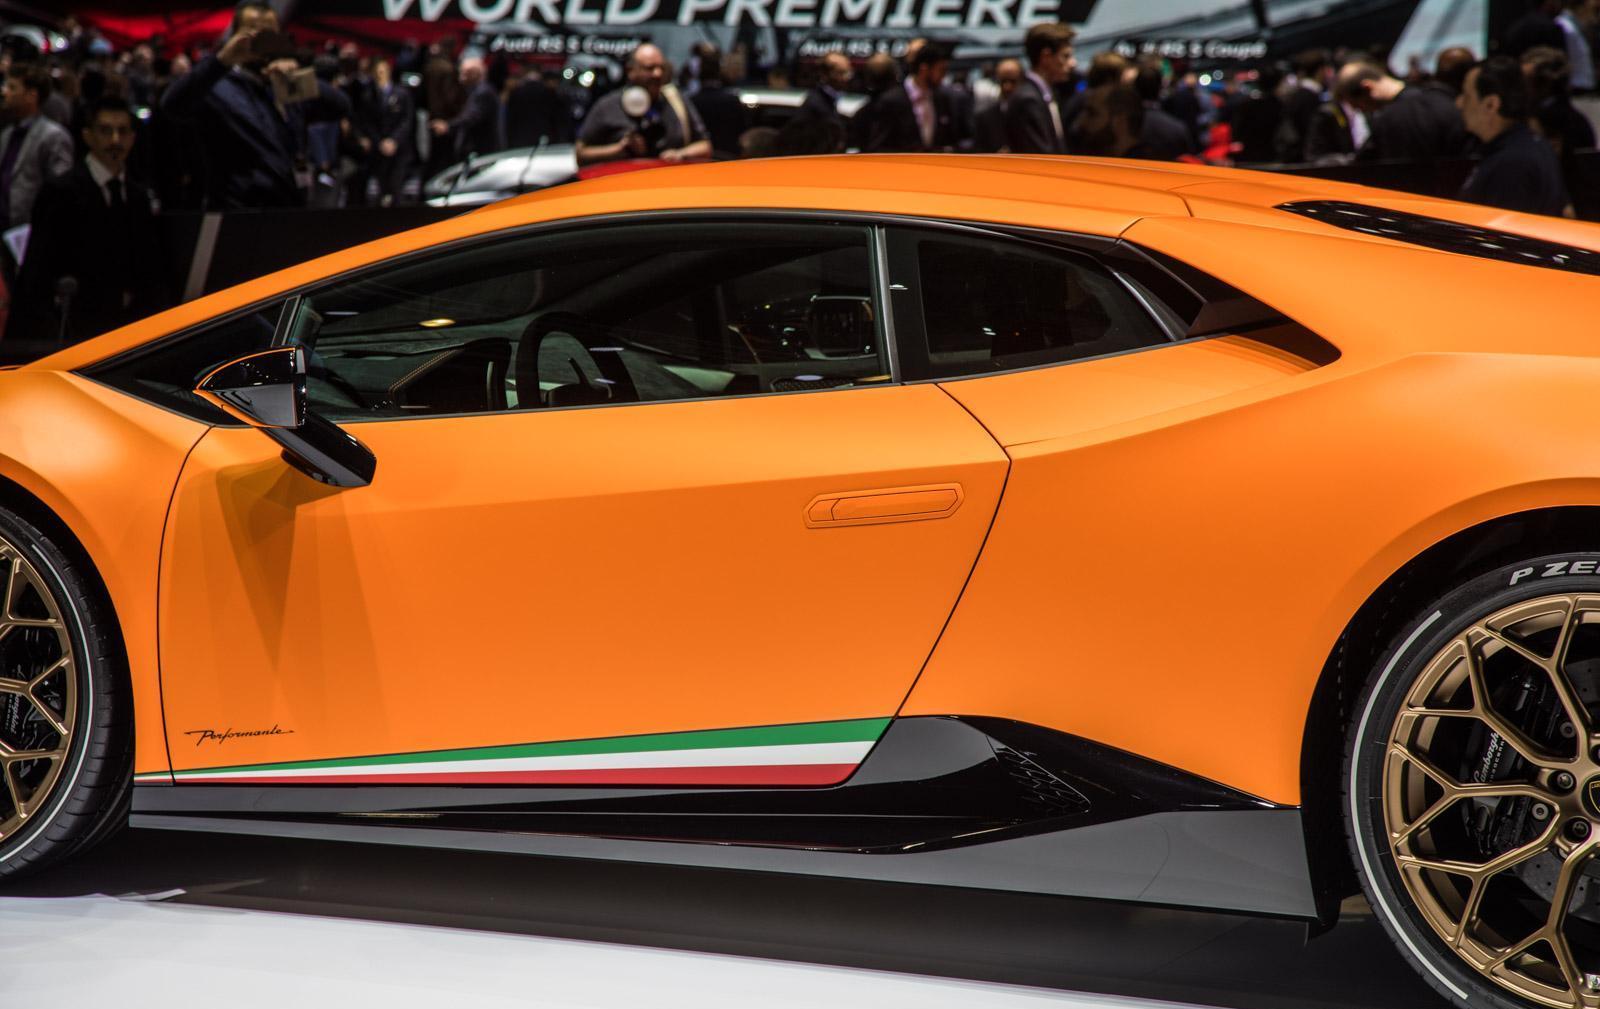 Lamborghini-Huracan-Performante-008